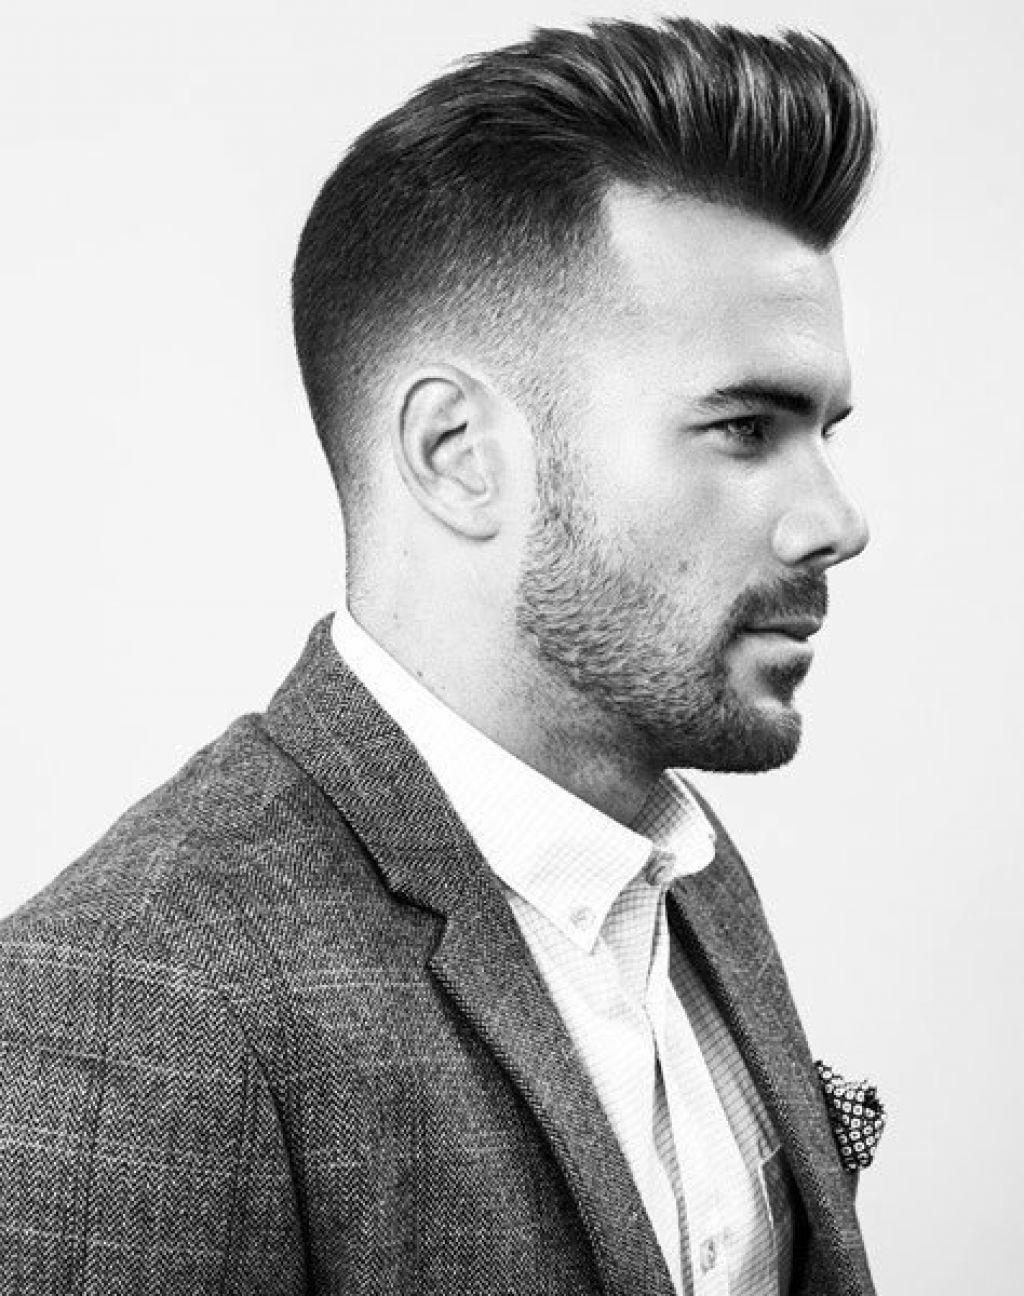 Modern pompadour beard - M Nner Kurzhaarfrisuren 2015 Undercut Ist Ein Trend Pompadour Cutmodern